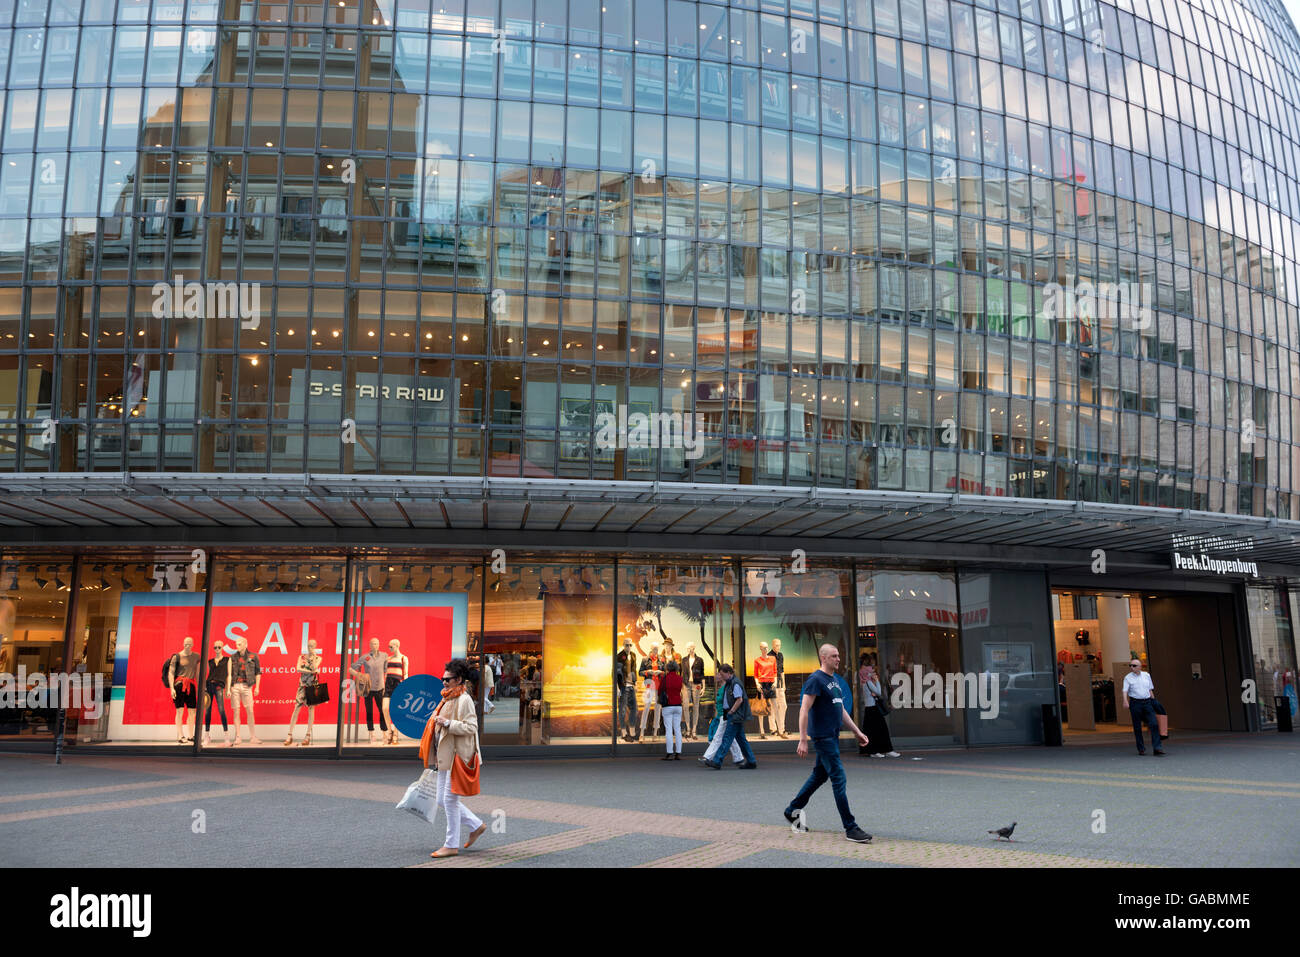 Peek & Cloppenburg department store, Cologne, North Rhine-Westphalia, Germany. Stock Photo